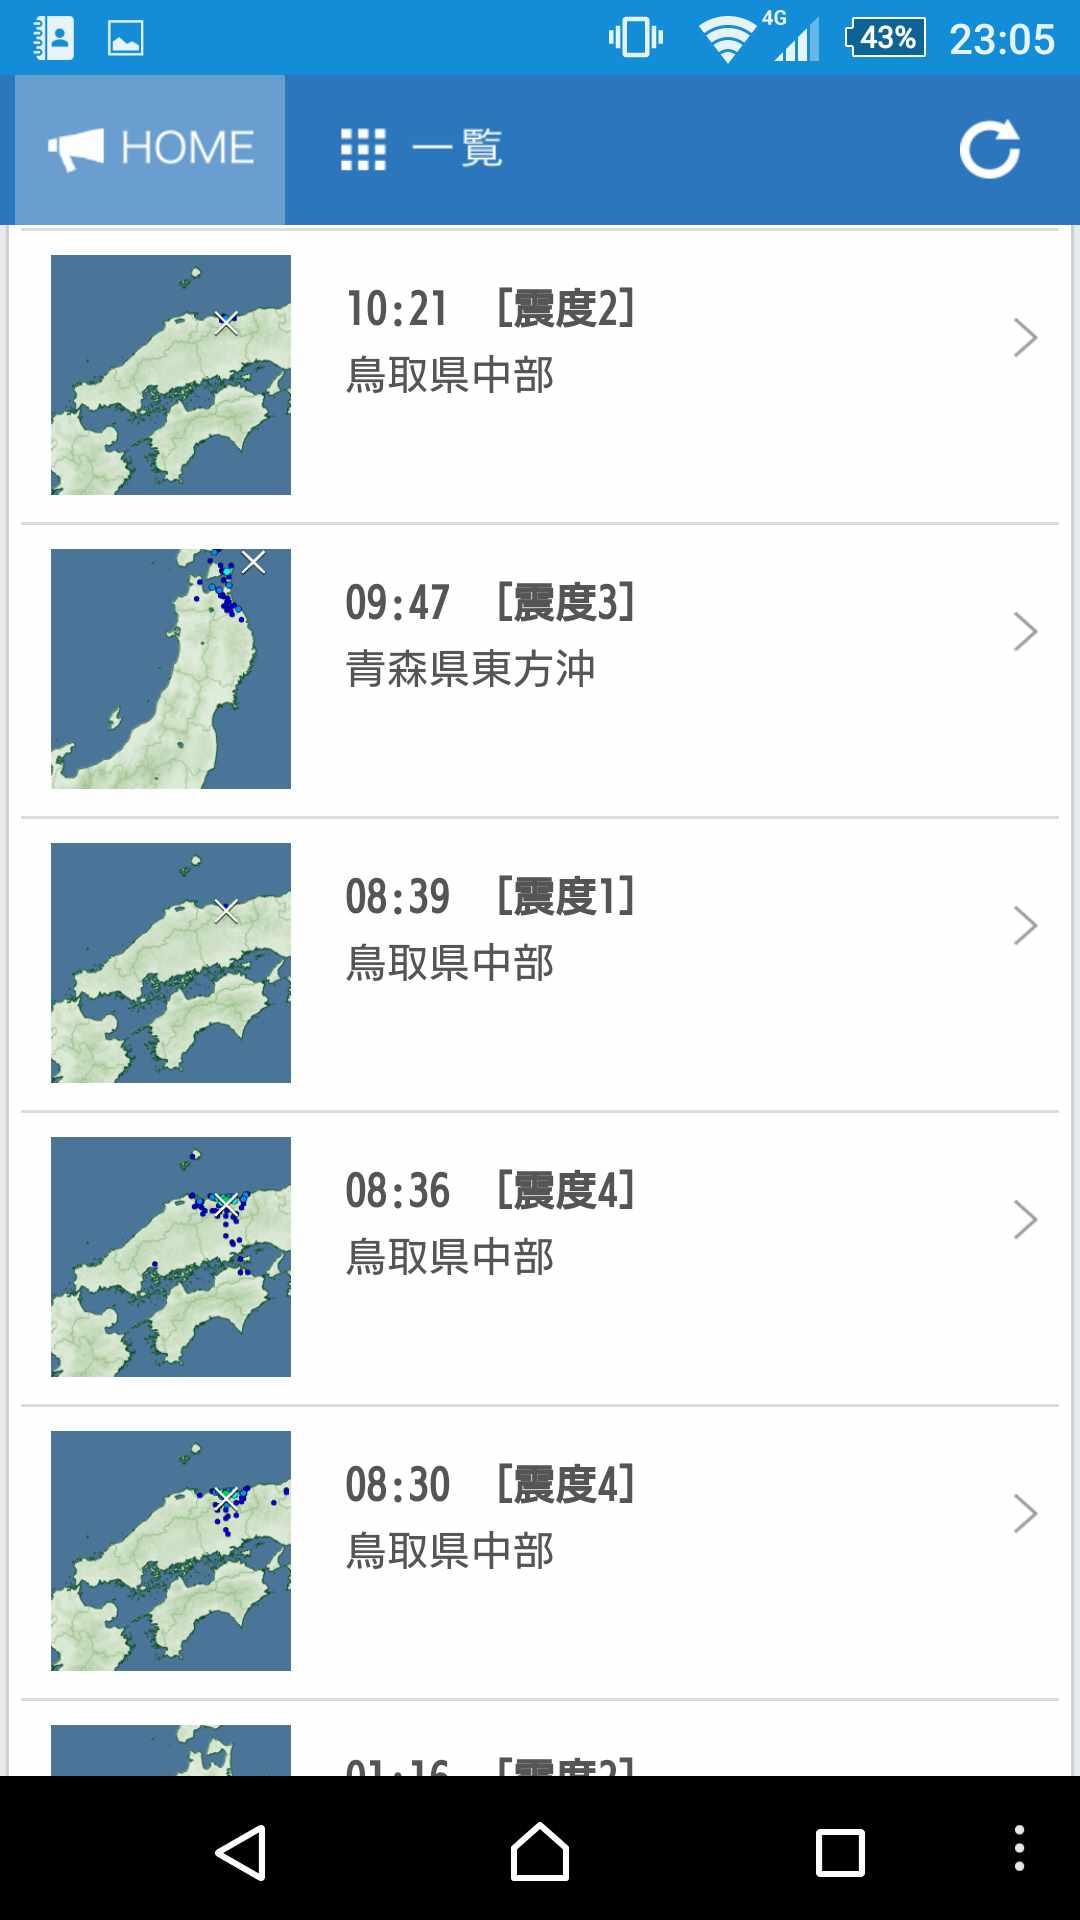 http://blog-imgs-81.fc2.com/o/k/a/okarutojishinyogen/news4vip_1445263860_103.jpg